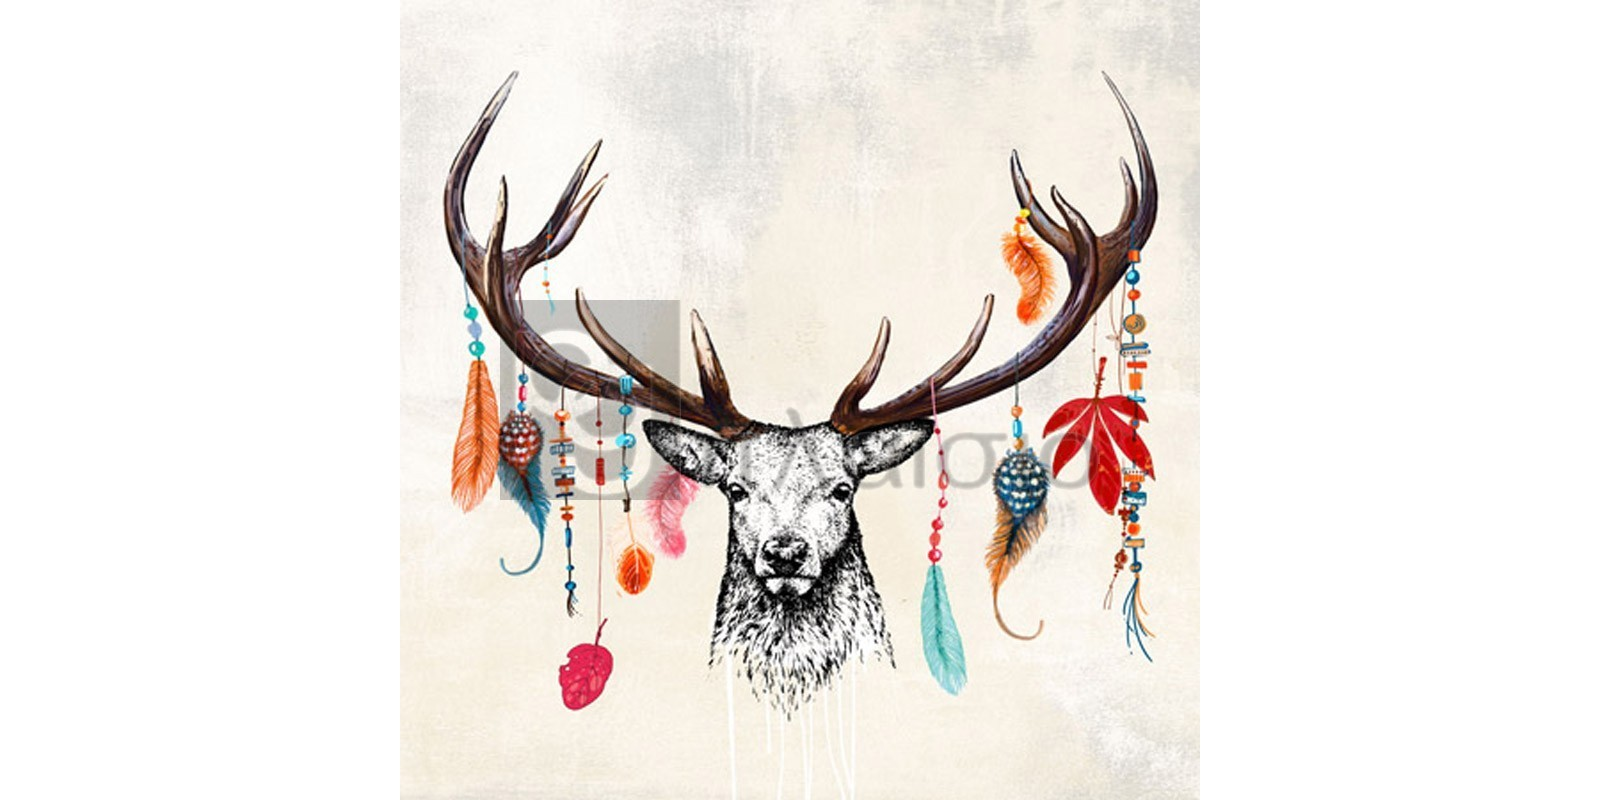 Matt Spencer - Wild Mesmerizer